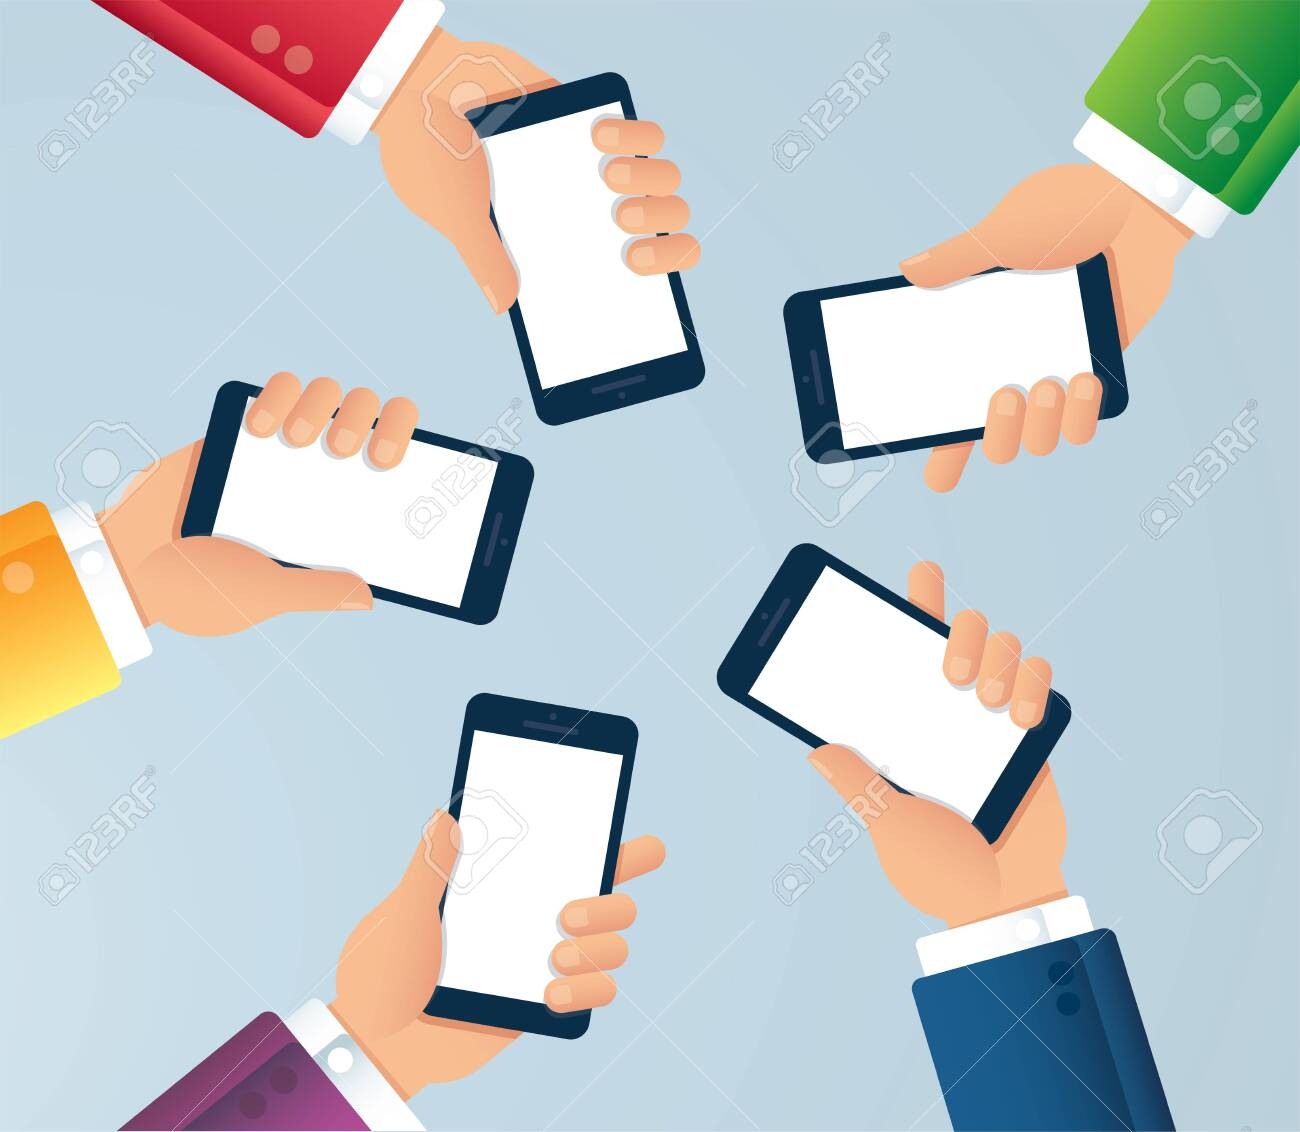 many hands holding smartphone vector illustration EPS10 - 137859587